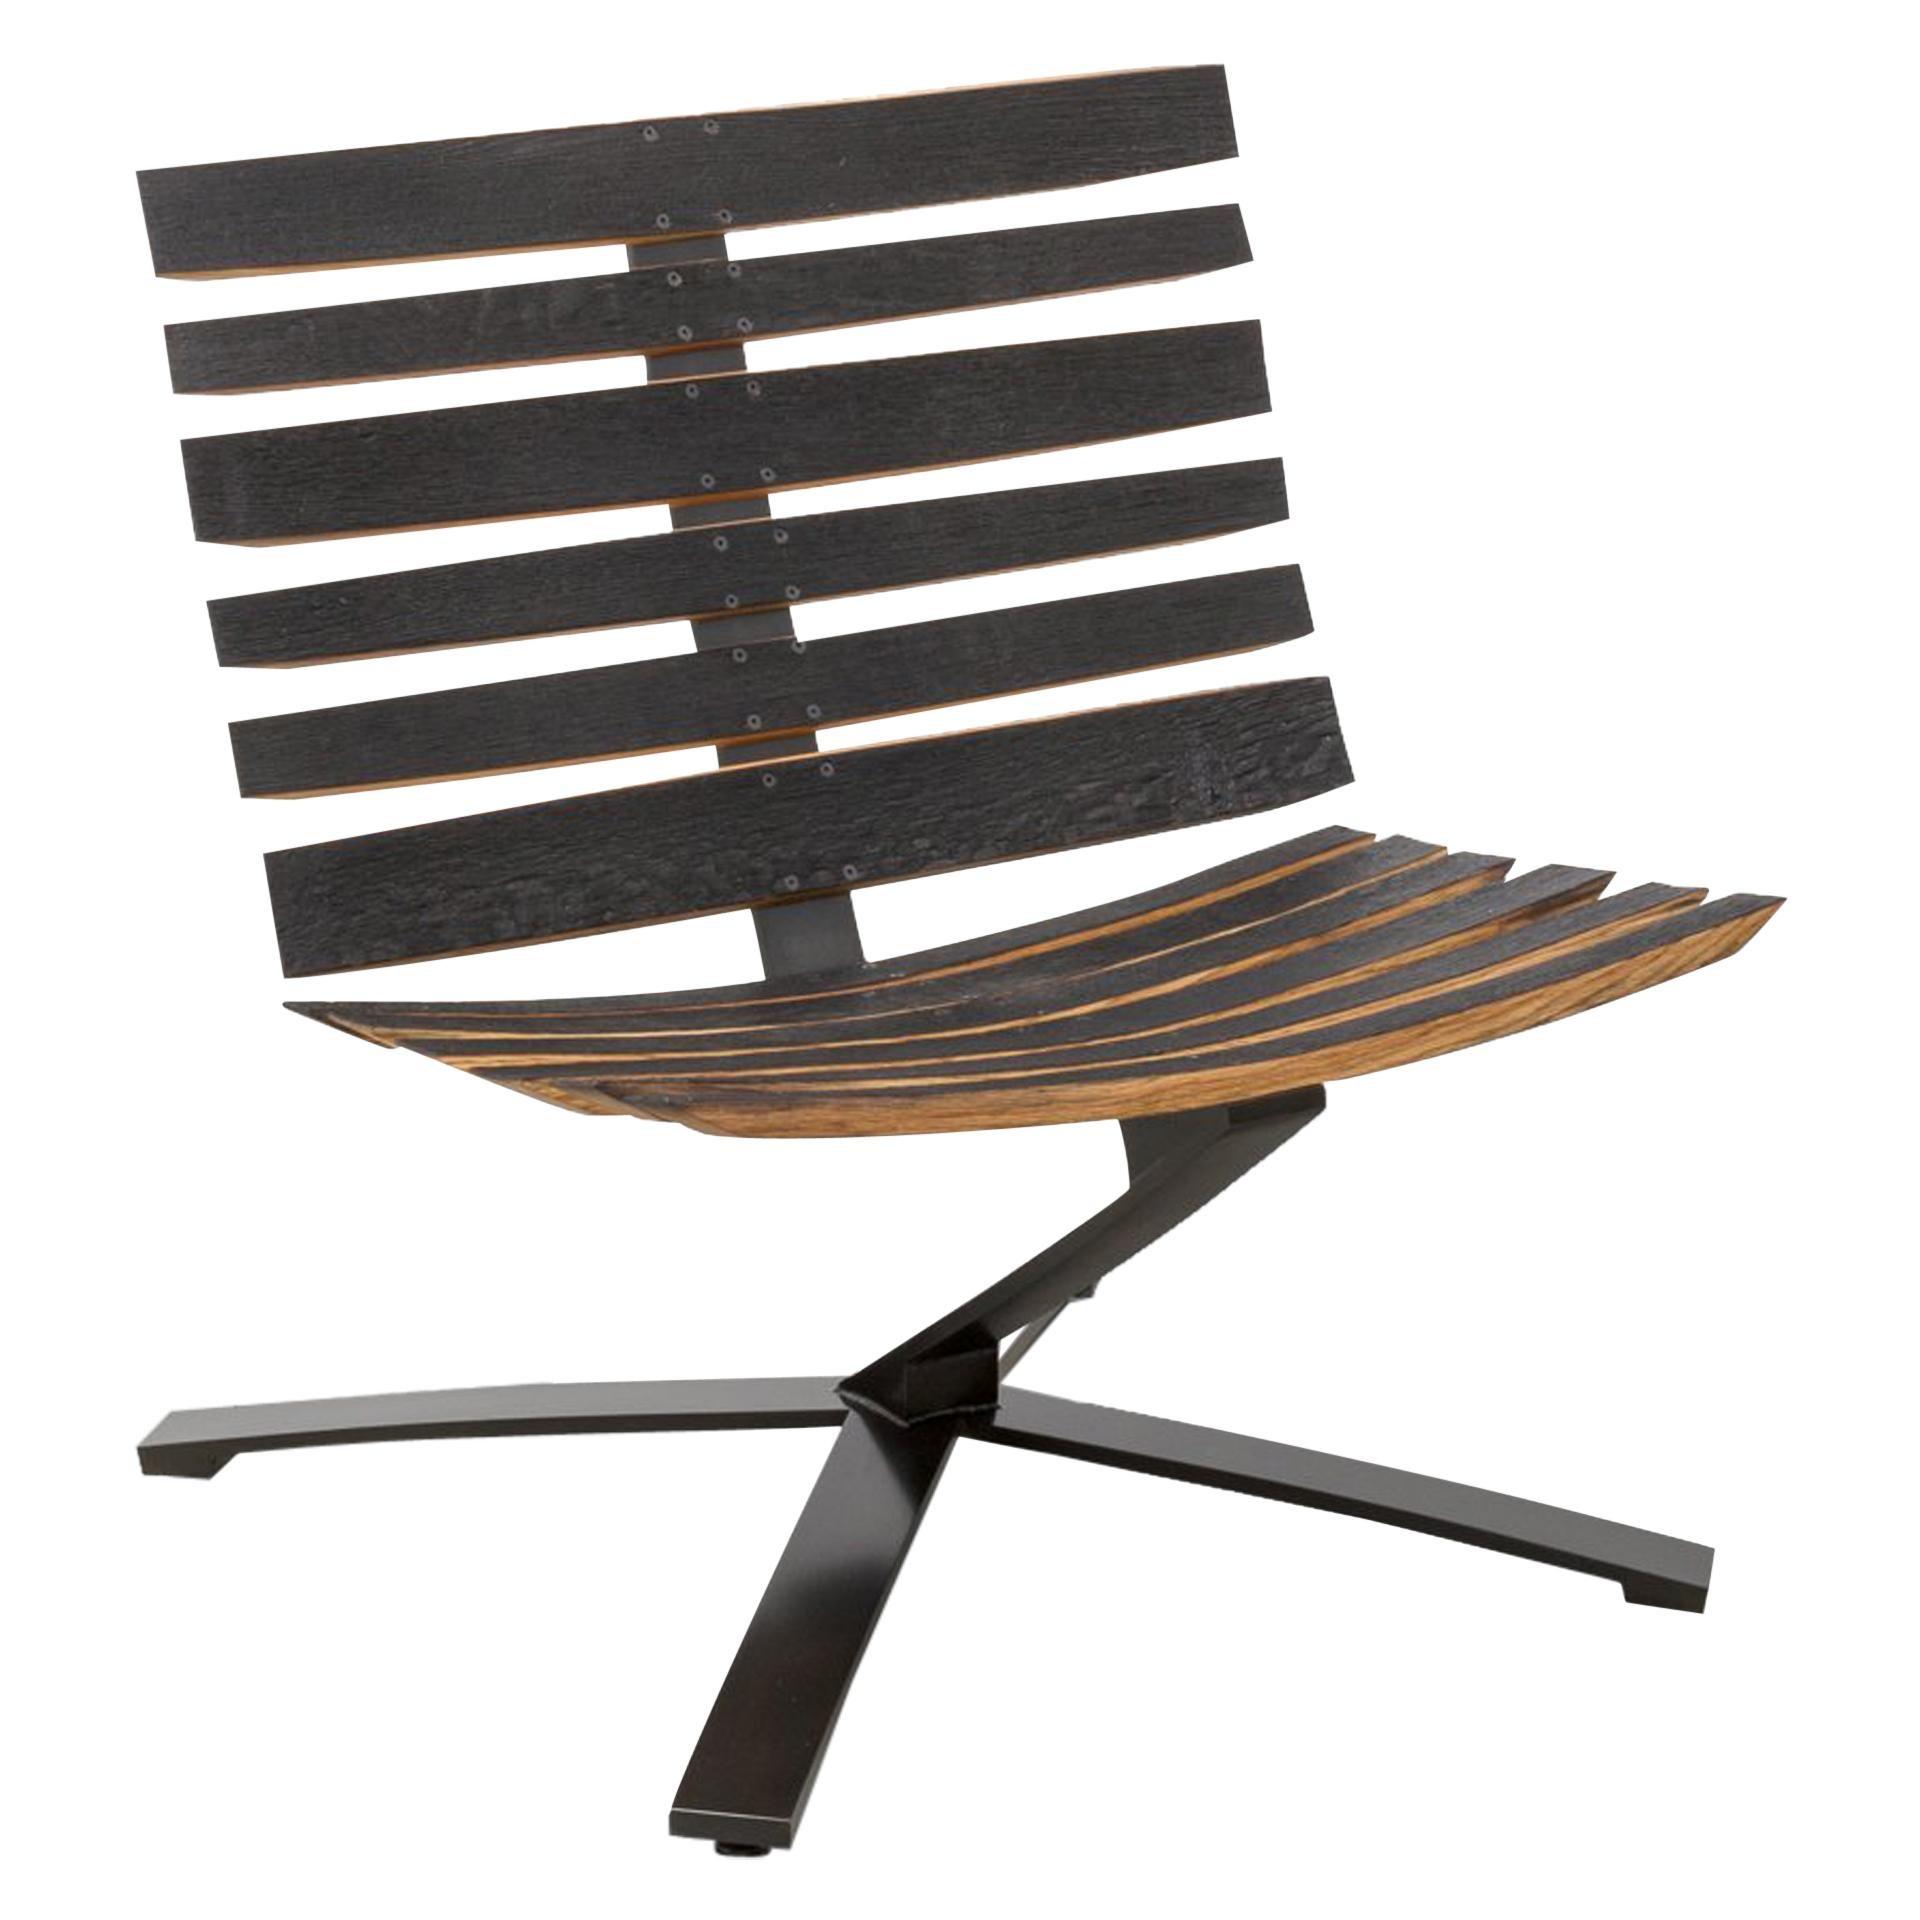 Bilge Lounge Chair